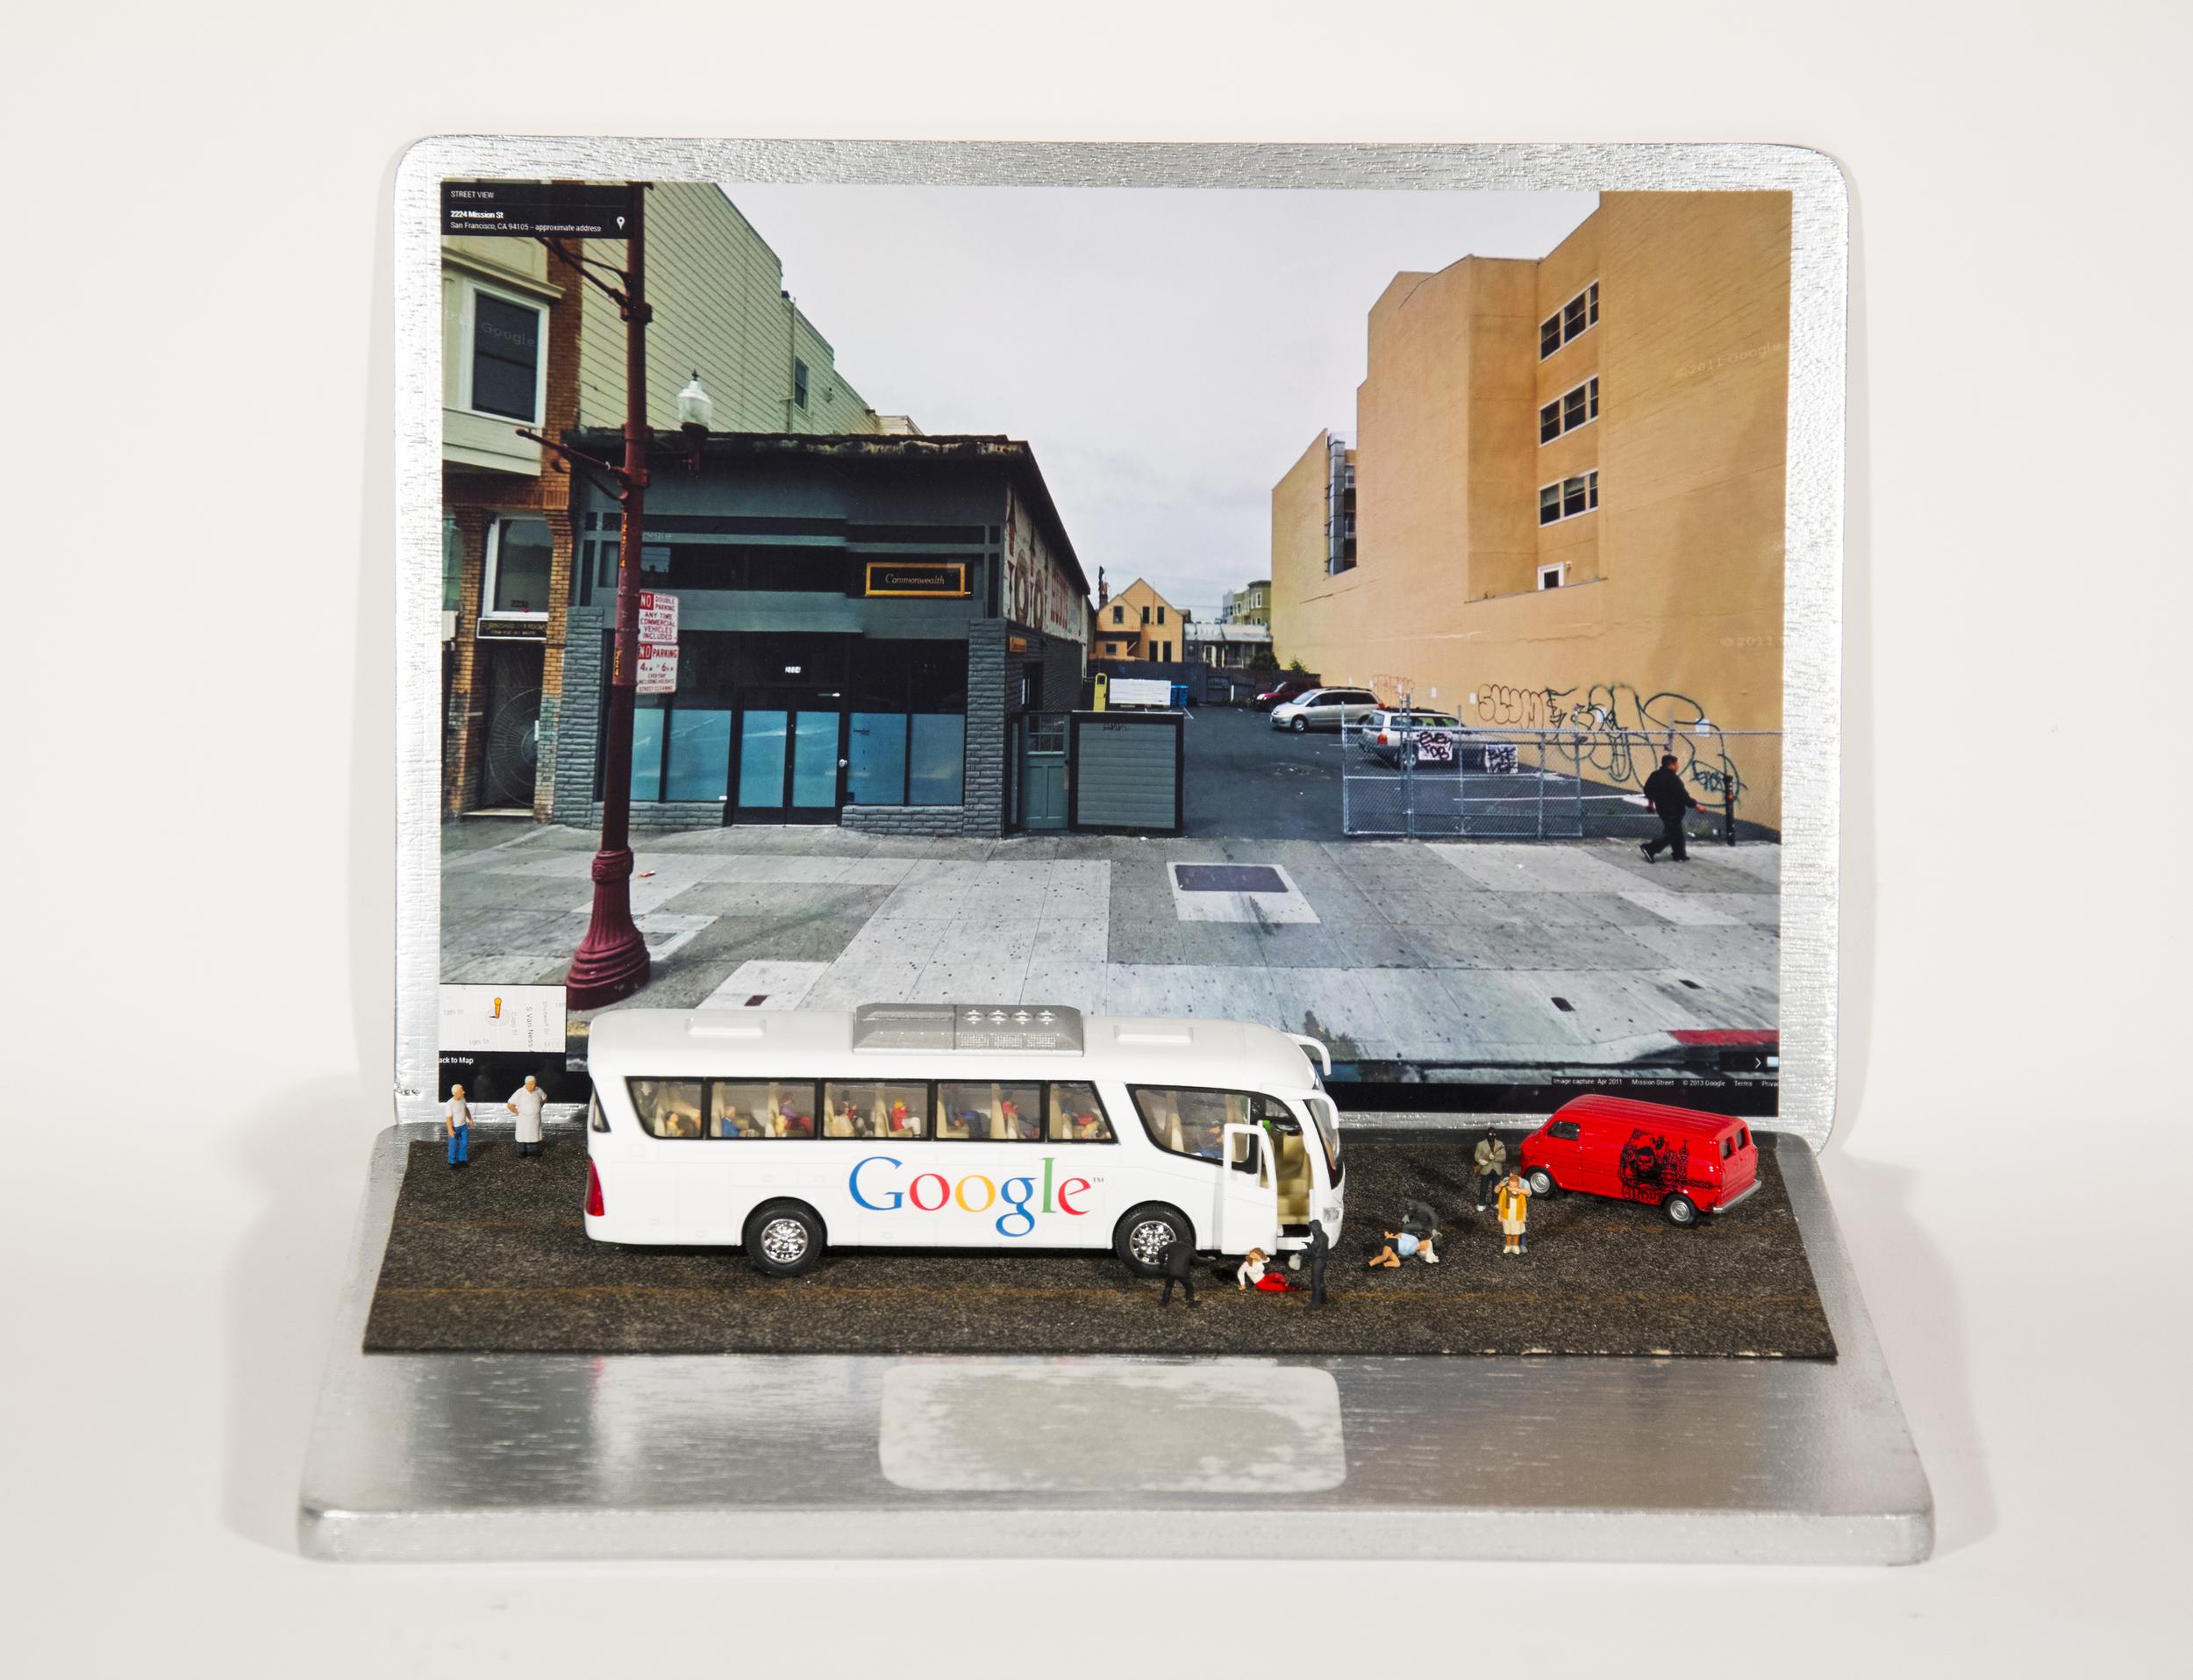 COLL.EO, The Bay Area Matatu Express, 2014